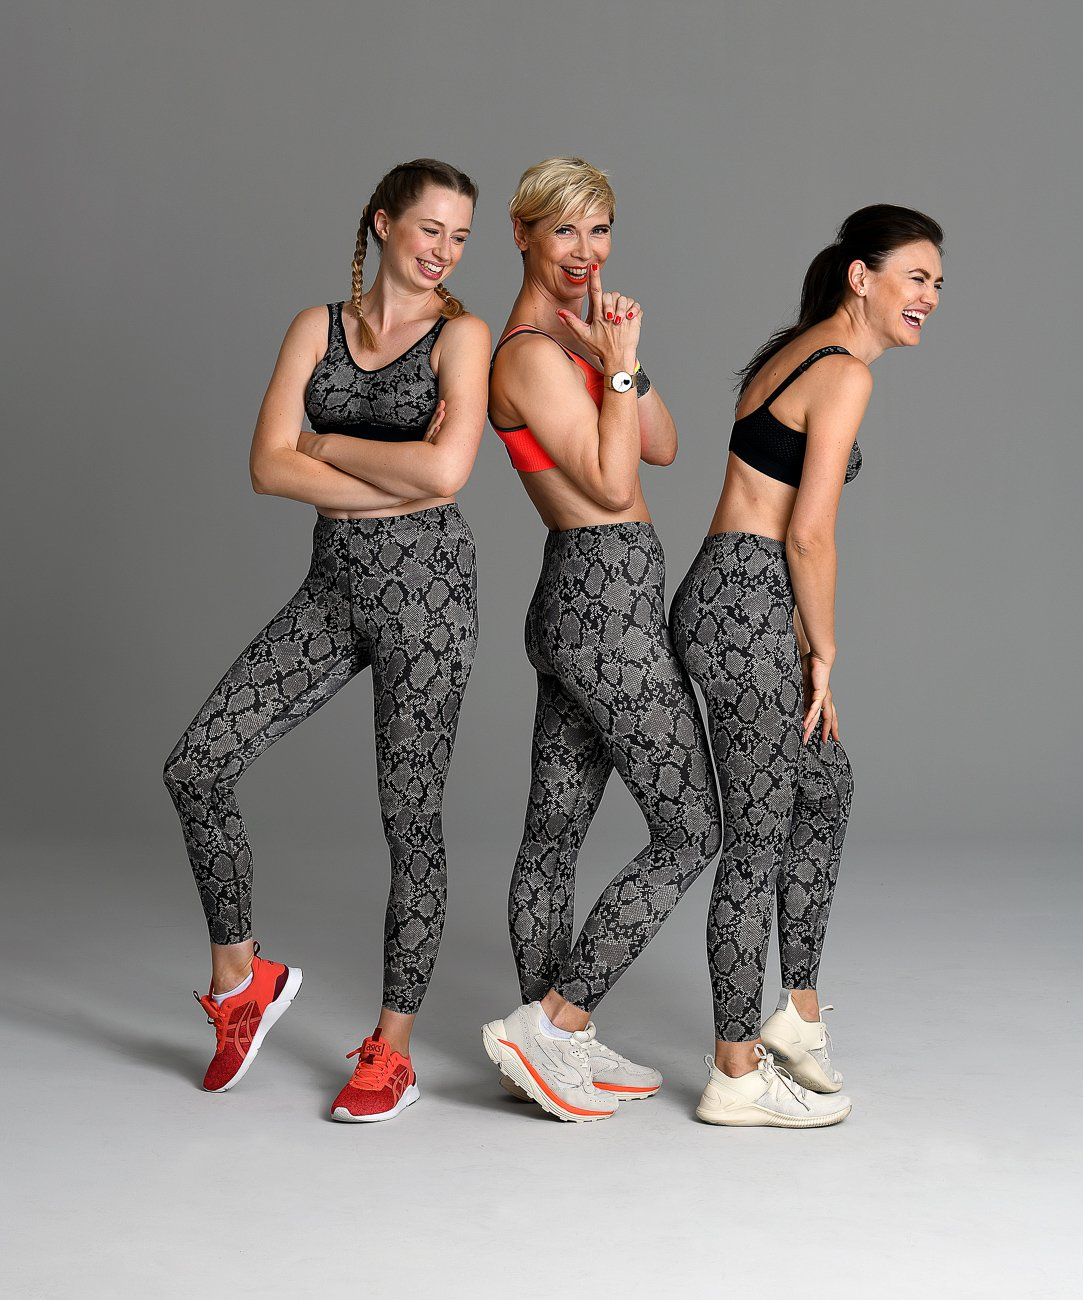 conny doll lifestyle: Fotoshooting, Anita Active, Sporthose, Sport-BH, Workout, Sportkleidung Damen